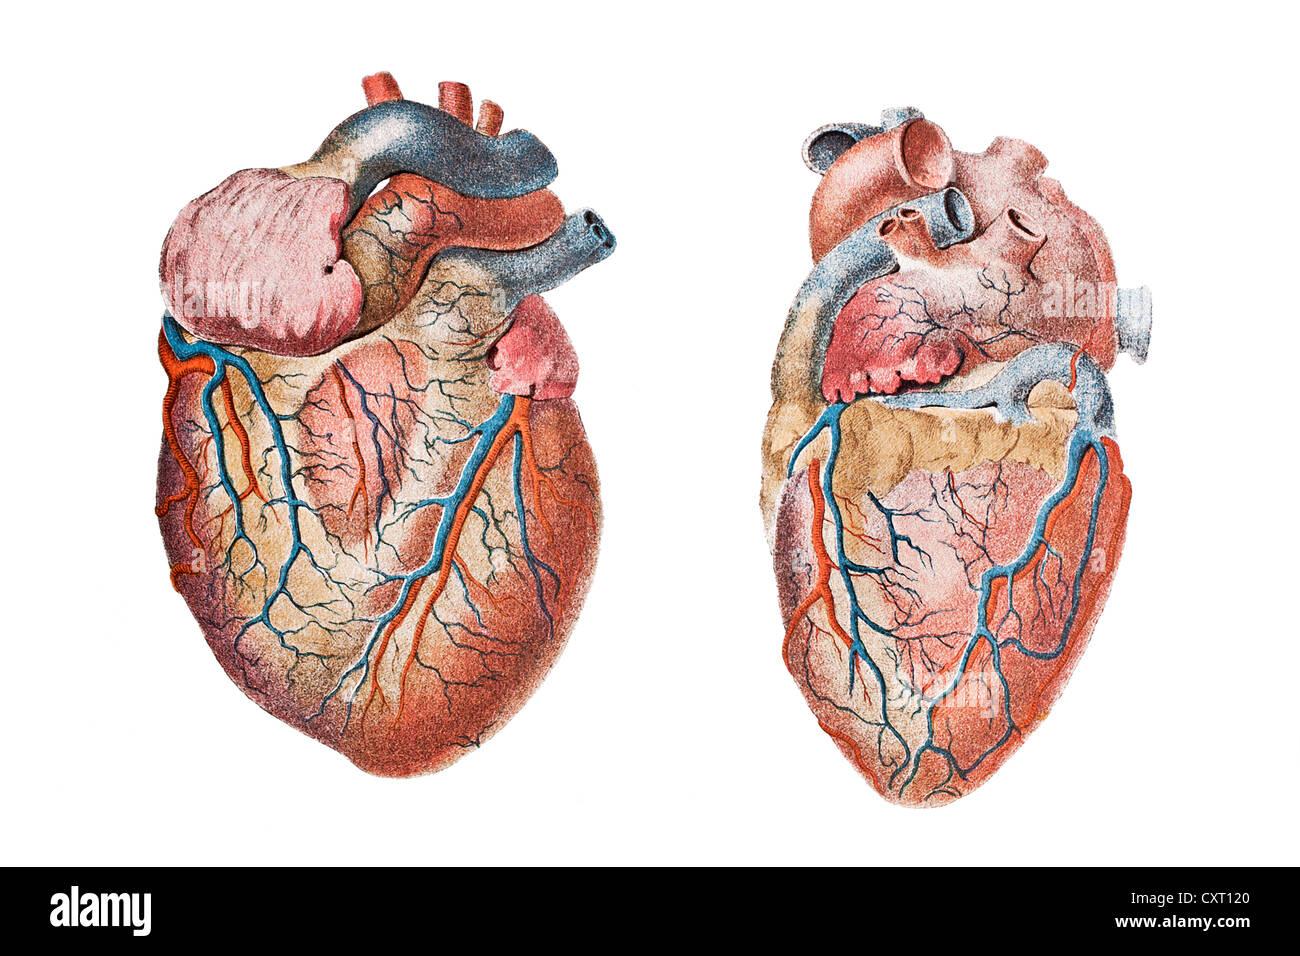 anatomical heart diagram nissan navara radio wiring drawing stock photos human illustration image